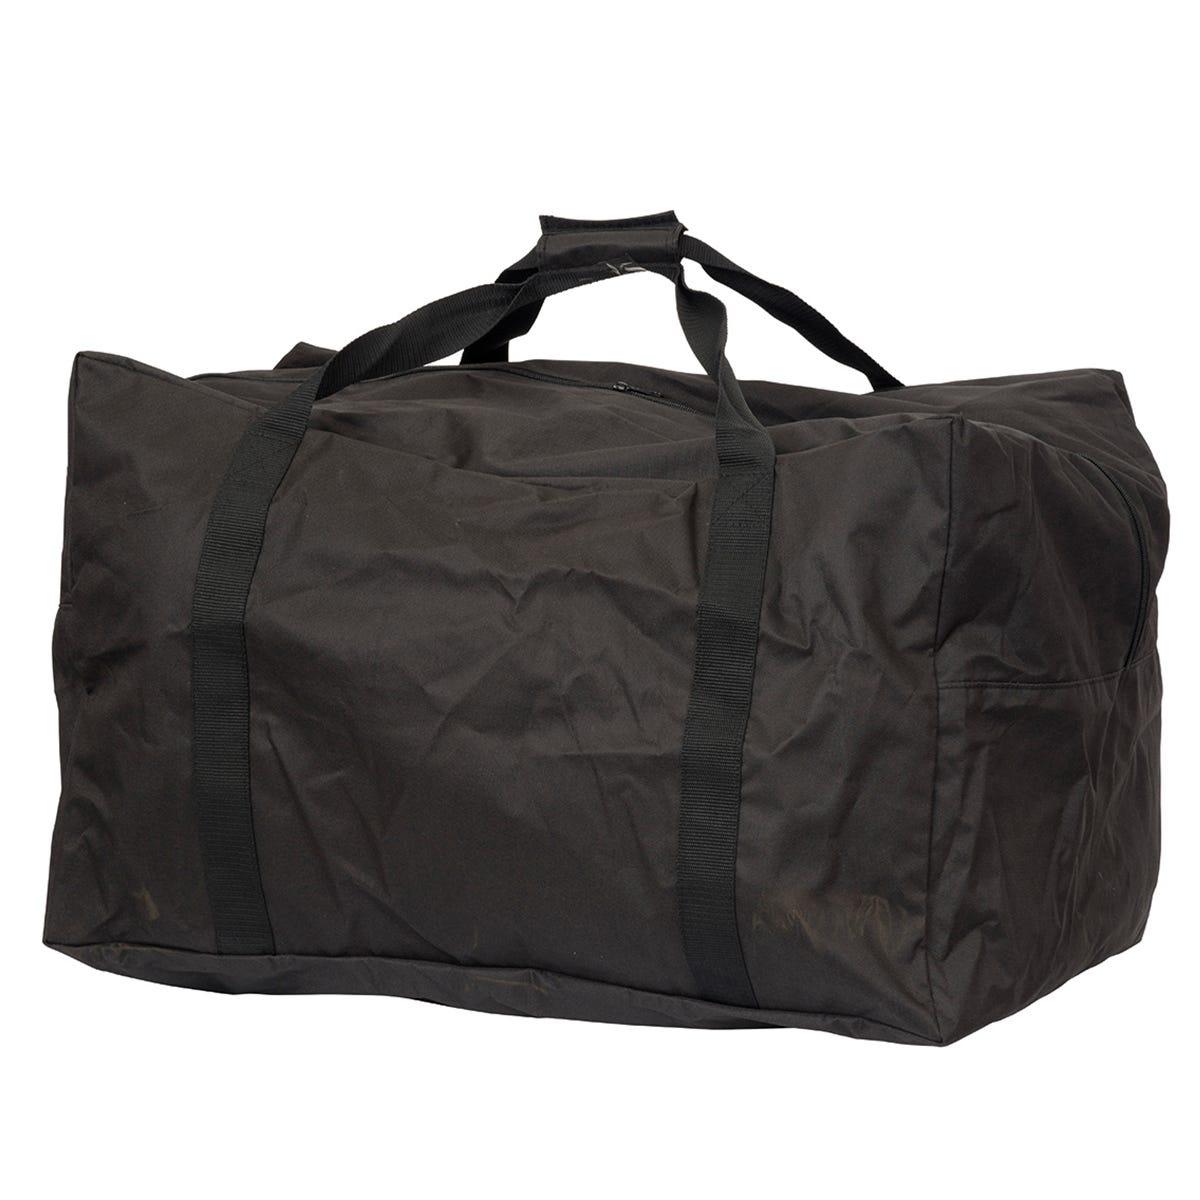 Lifestyle Appliances Heavy Duty Carry Bag for TEK Portable Gas BBQ